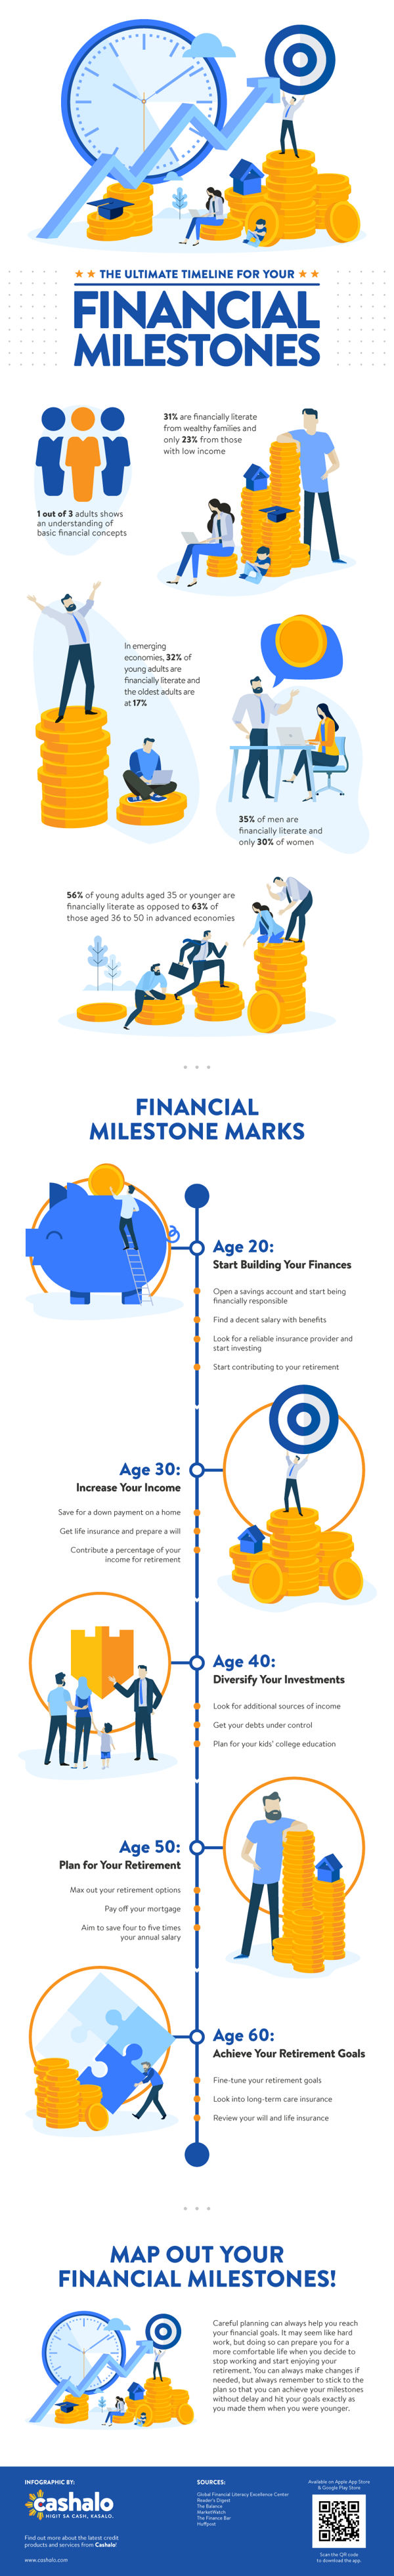 financial milestone